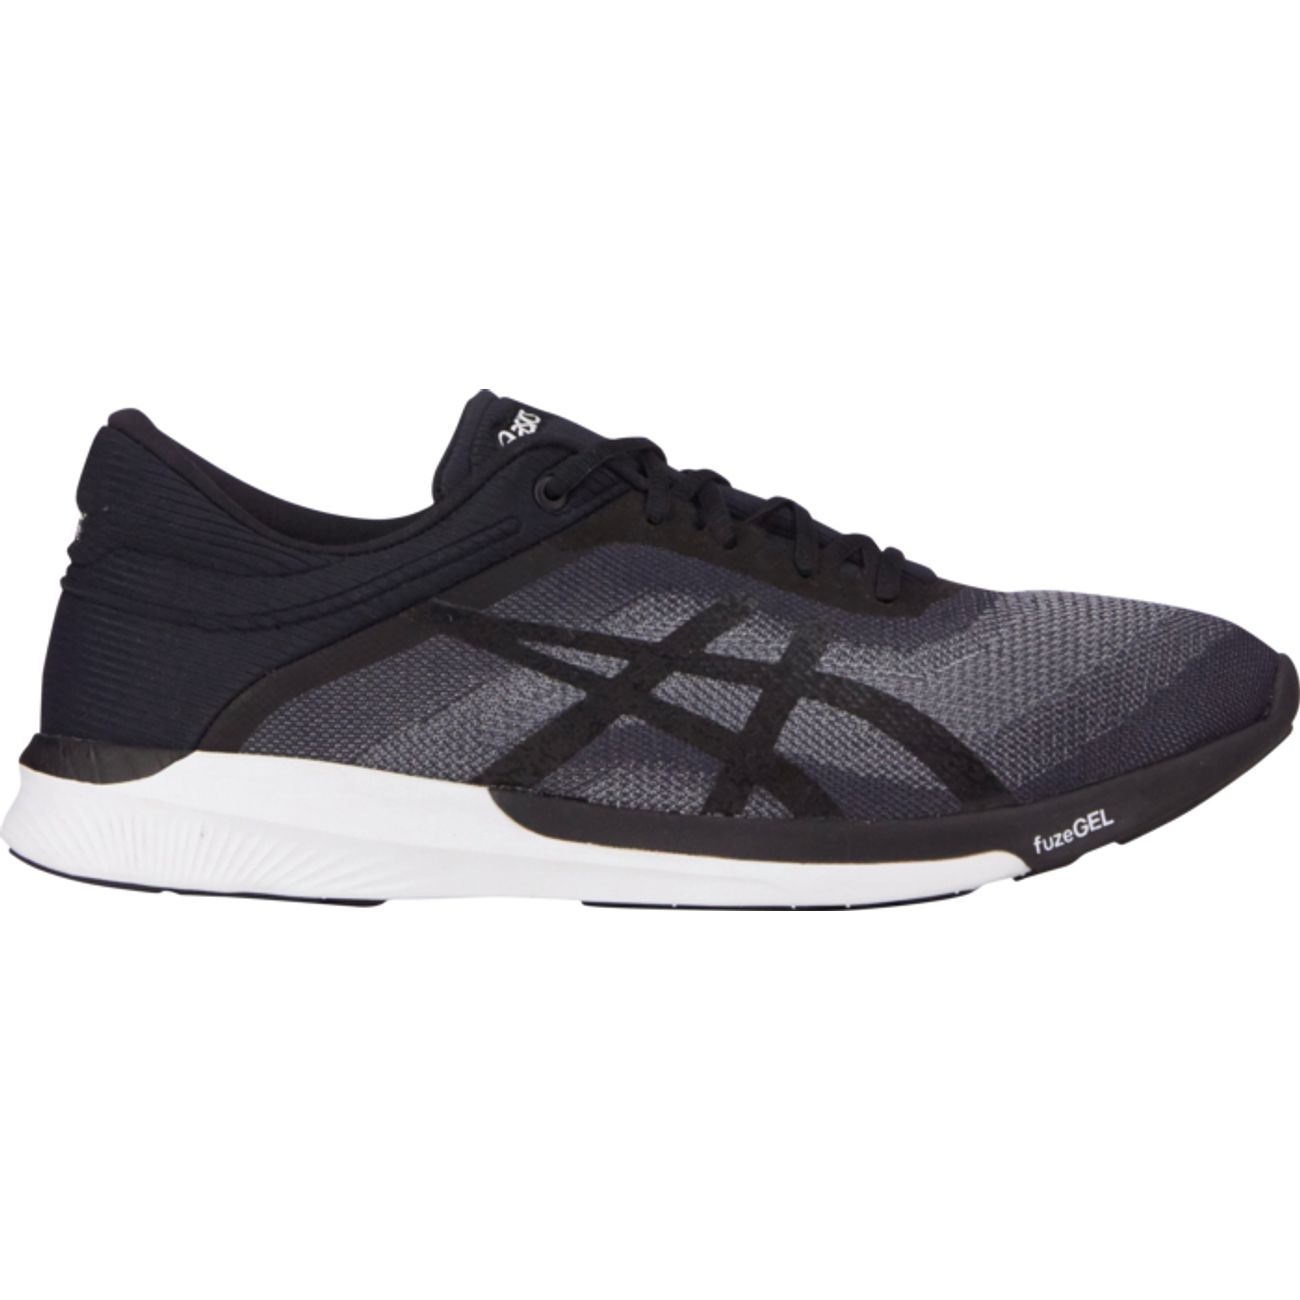 Asics M Rush X Running Chaussures Fuze Yg7bf6y